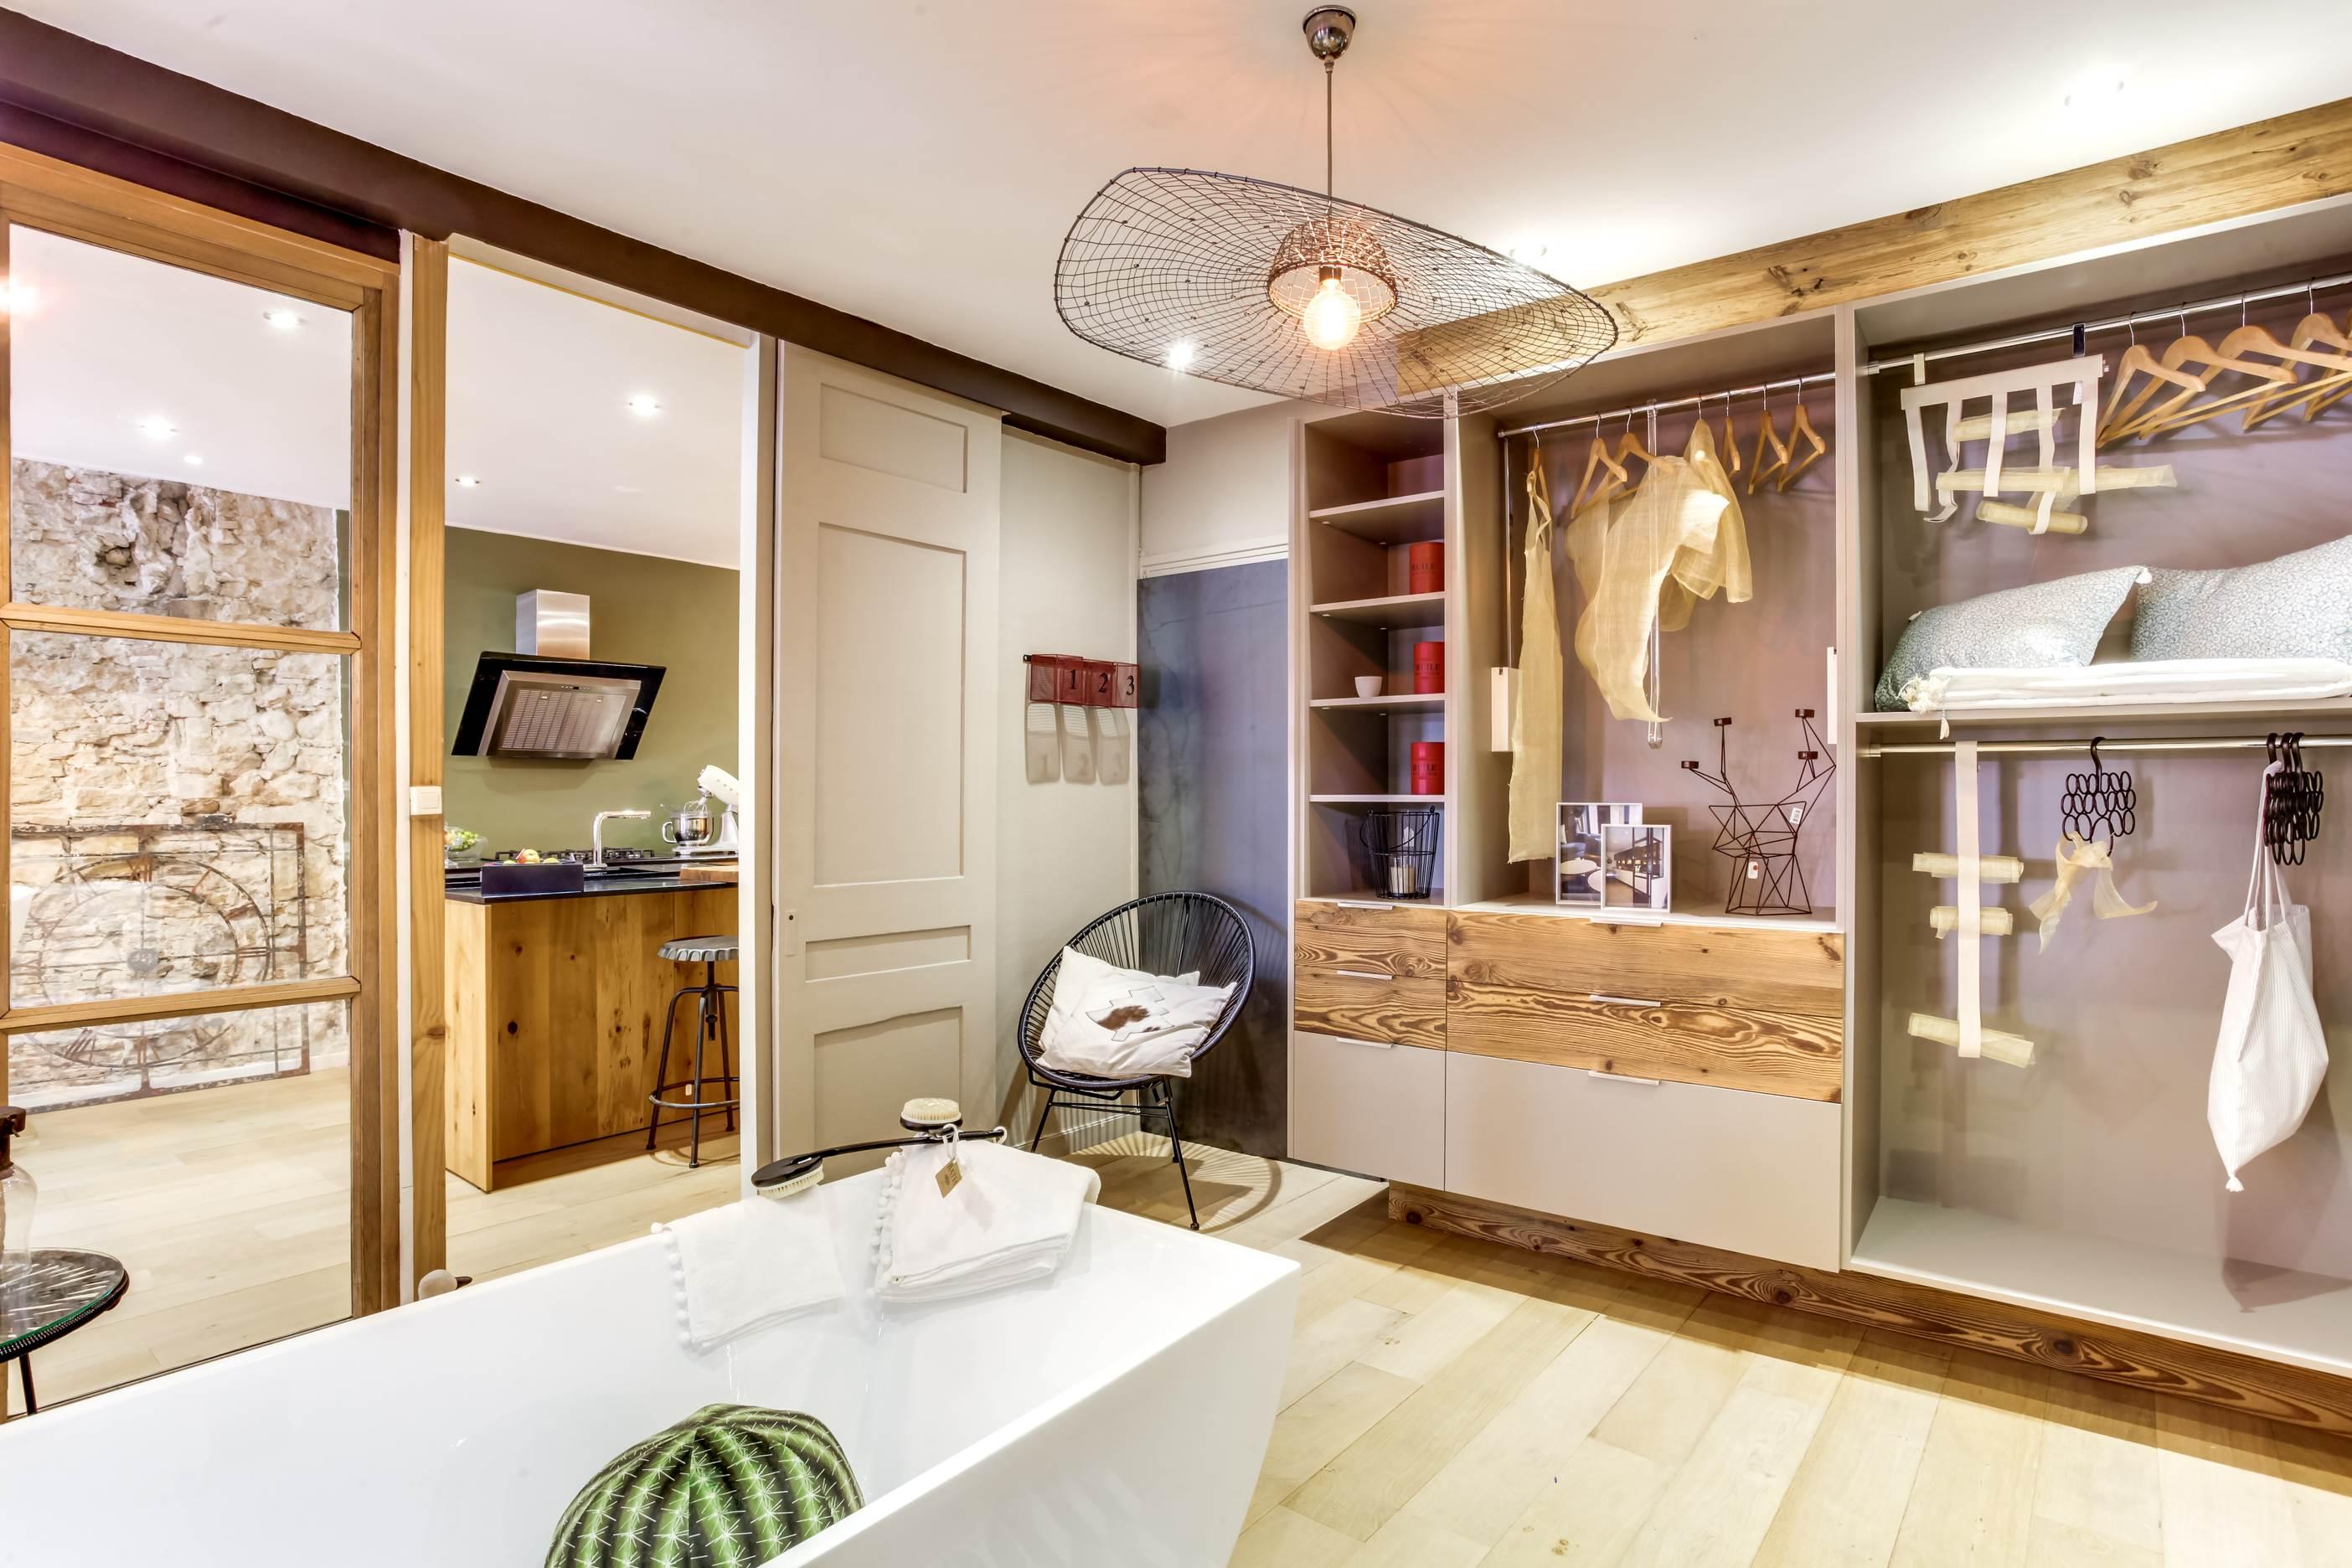 meuble salle de bain lyon elegant meuble salle de bain avec vasque a poser pour idee de salle. Black Bedroom Furniture Sets. Home Design Ideas